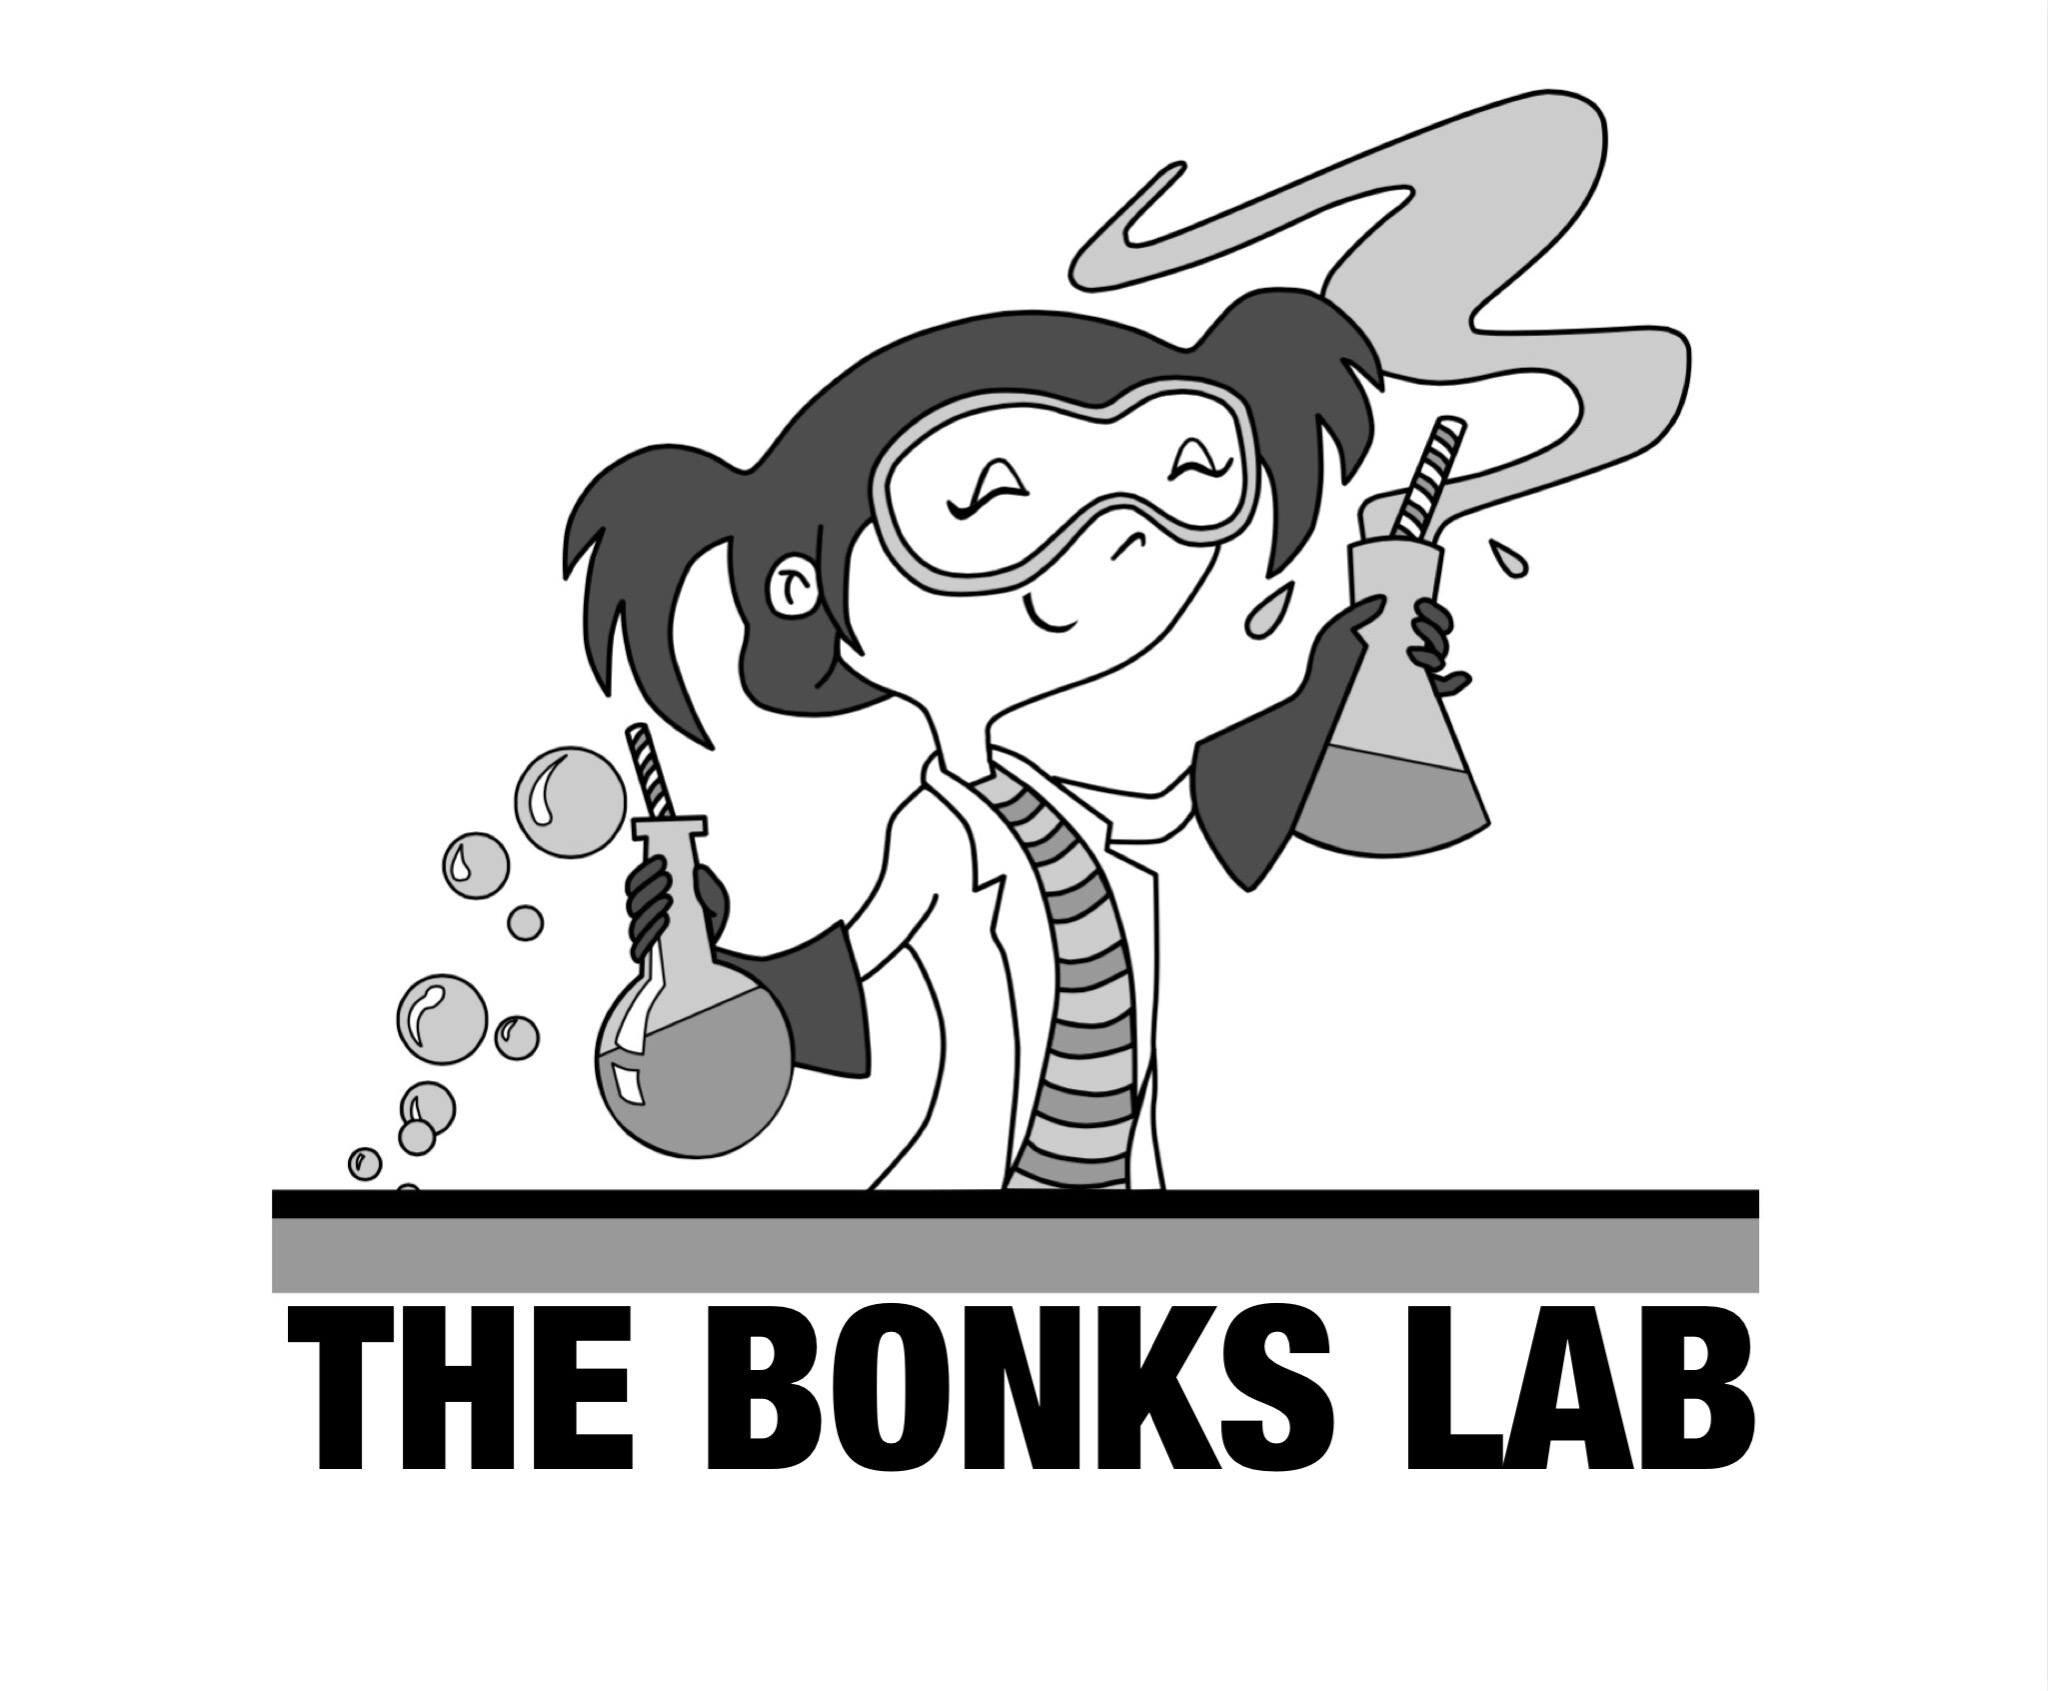 The Bonks Lab -